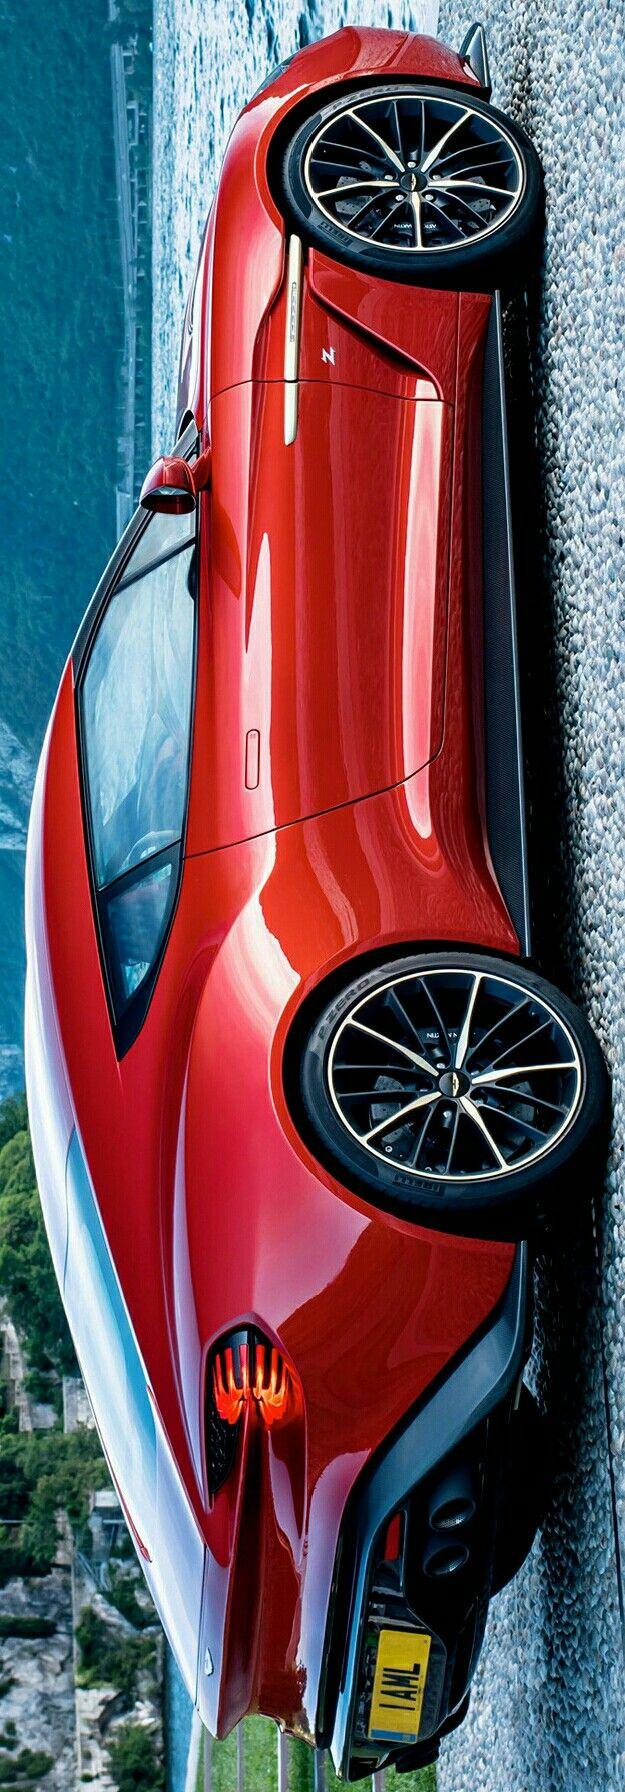 Aston Martin Vanquish Zagato by Levon